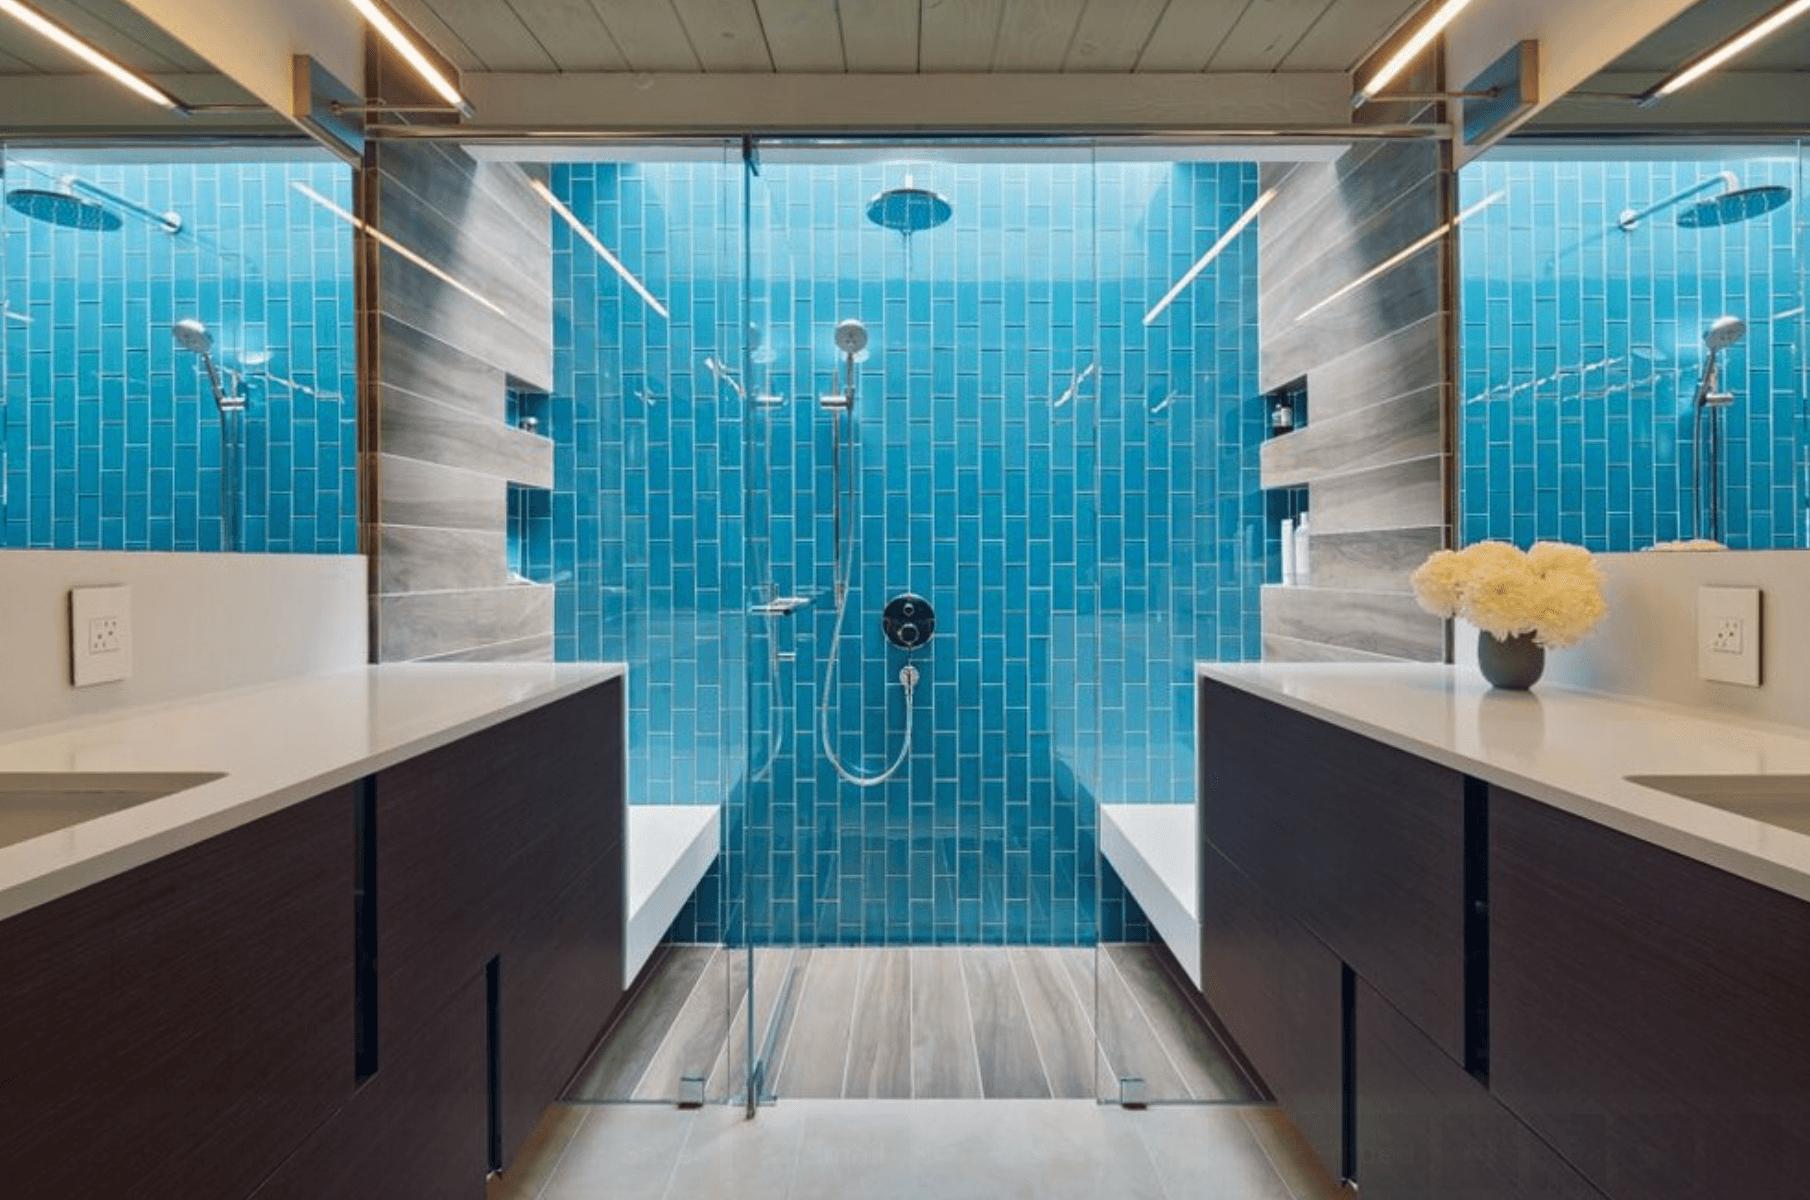 Banheiro Featured Pastilhas pisos e revestimentos #1E7794 1810x1200 Banheiro Com Revestimento Pastilhas